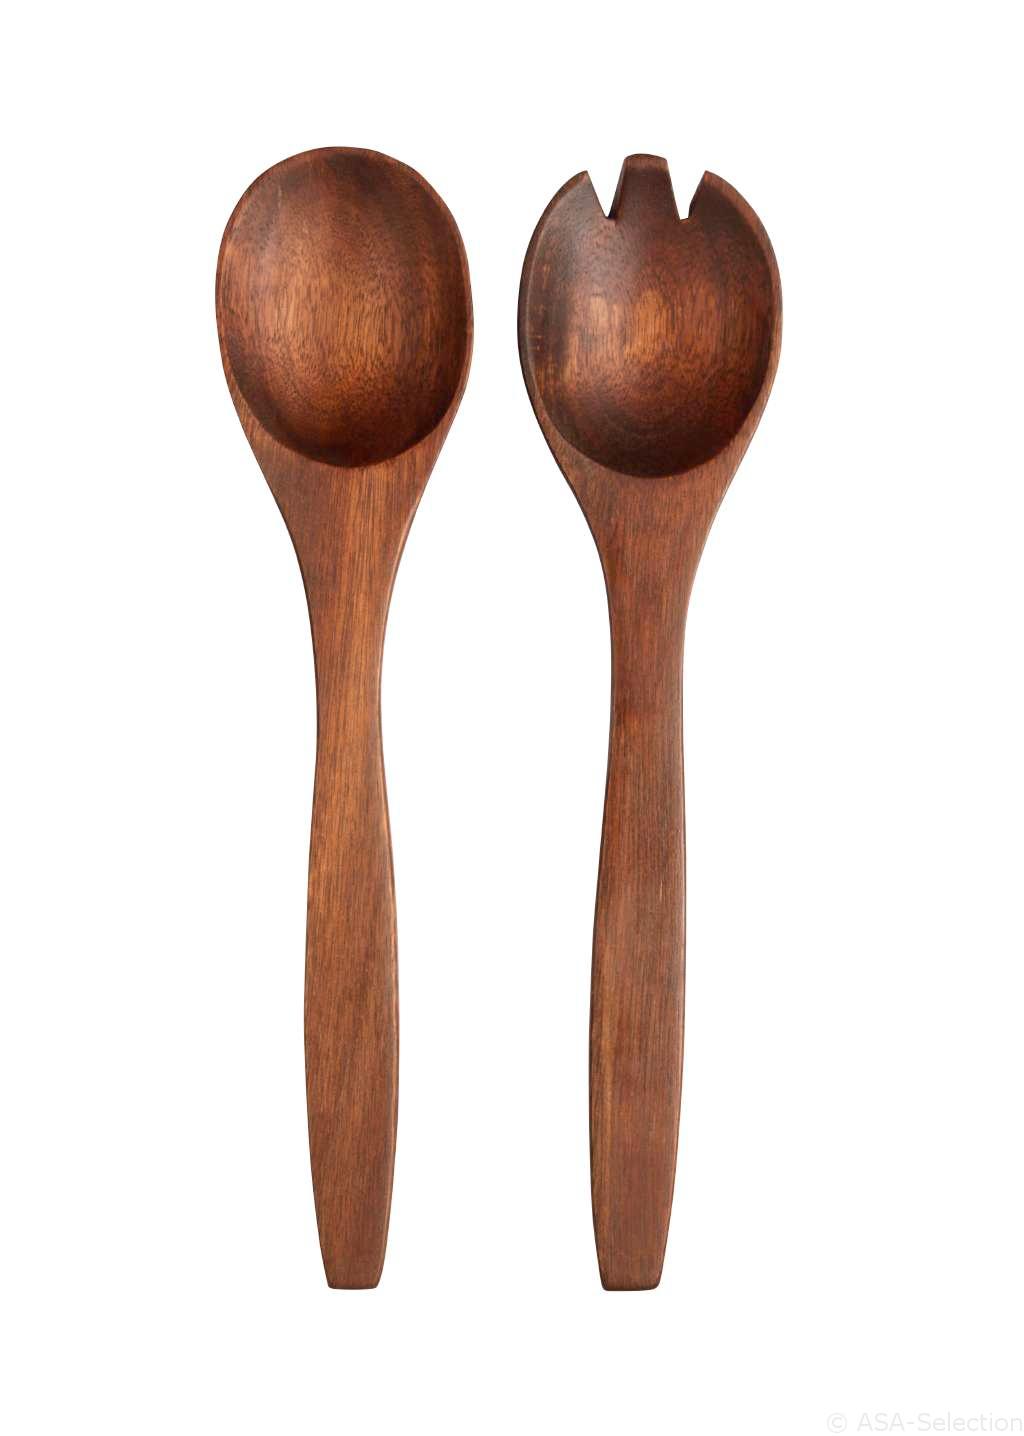 93920970 Wood - Tacâmuri din lemn, salcam (93920970)